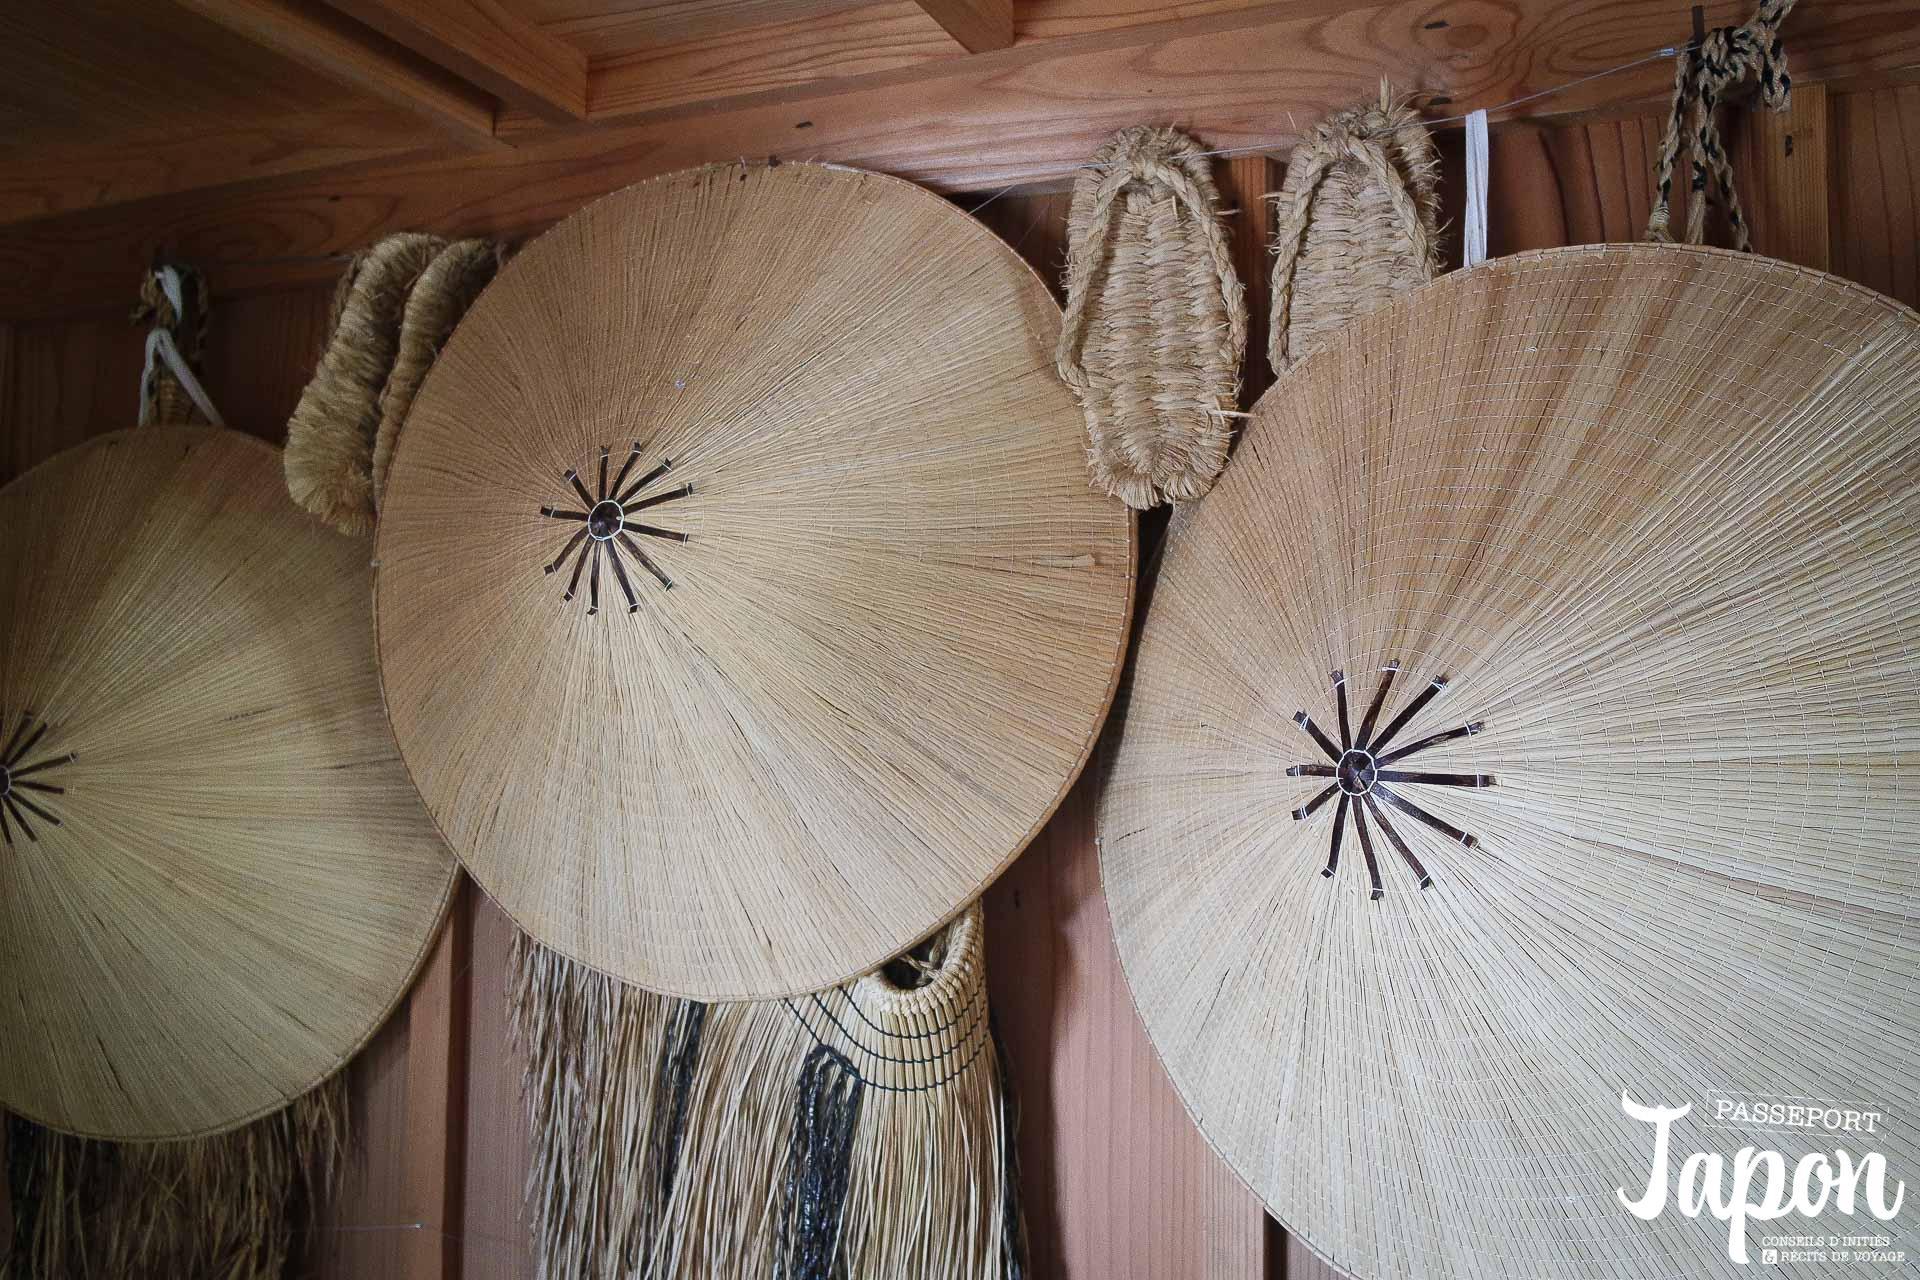 hakone-sekisho-musee-chapeaux-paille